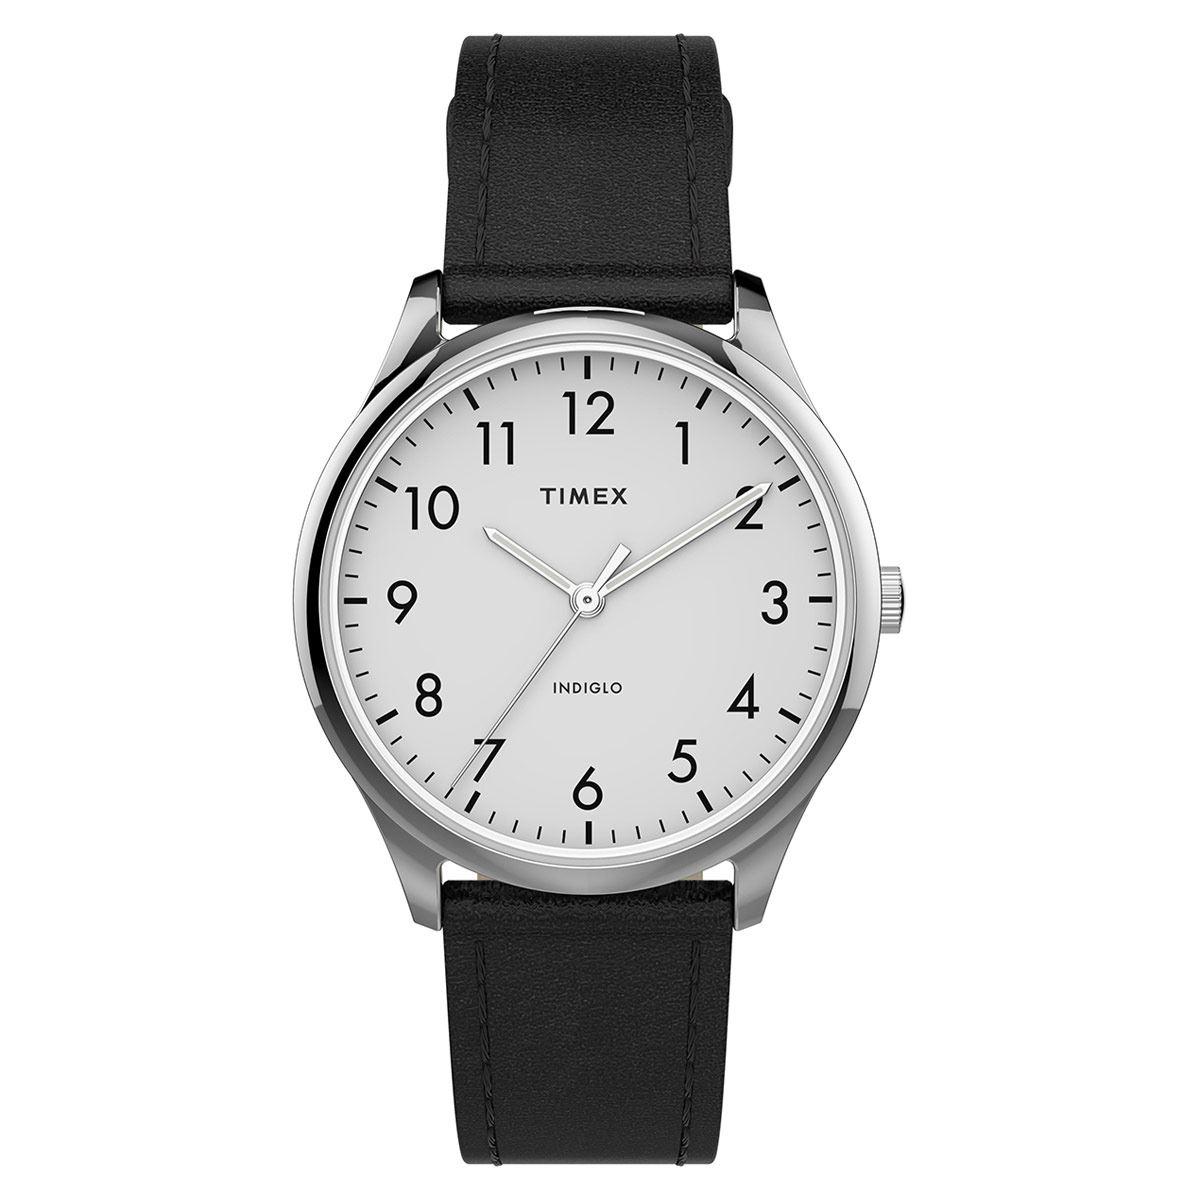 Reloj Timex TW2T72100 de Dama